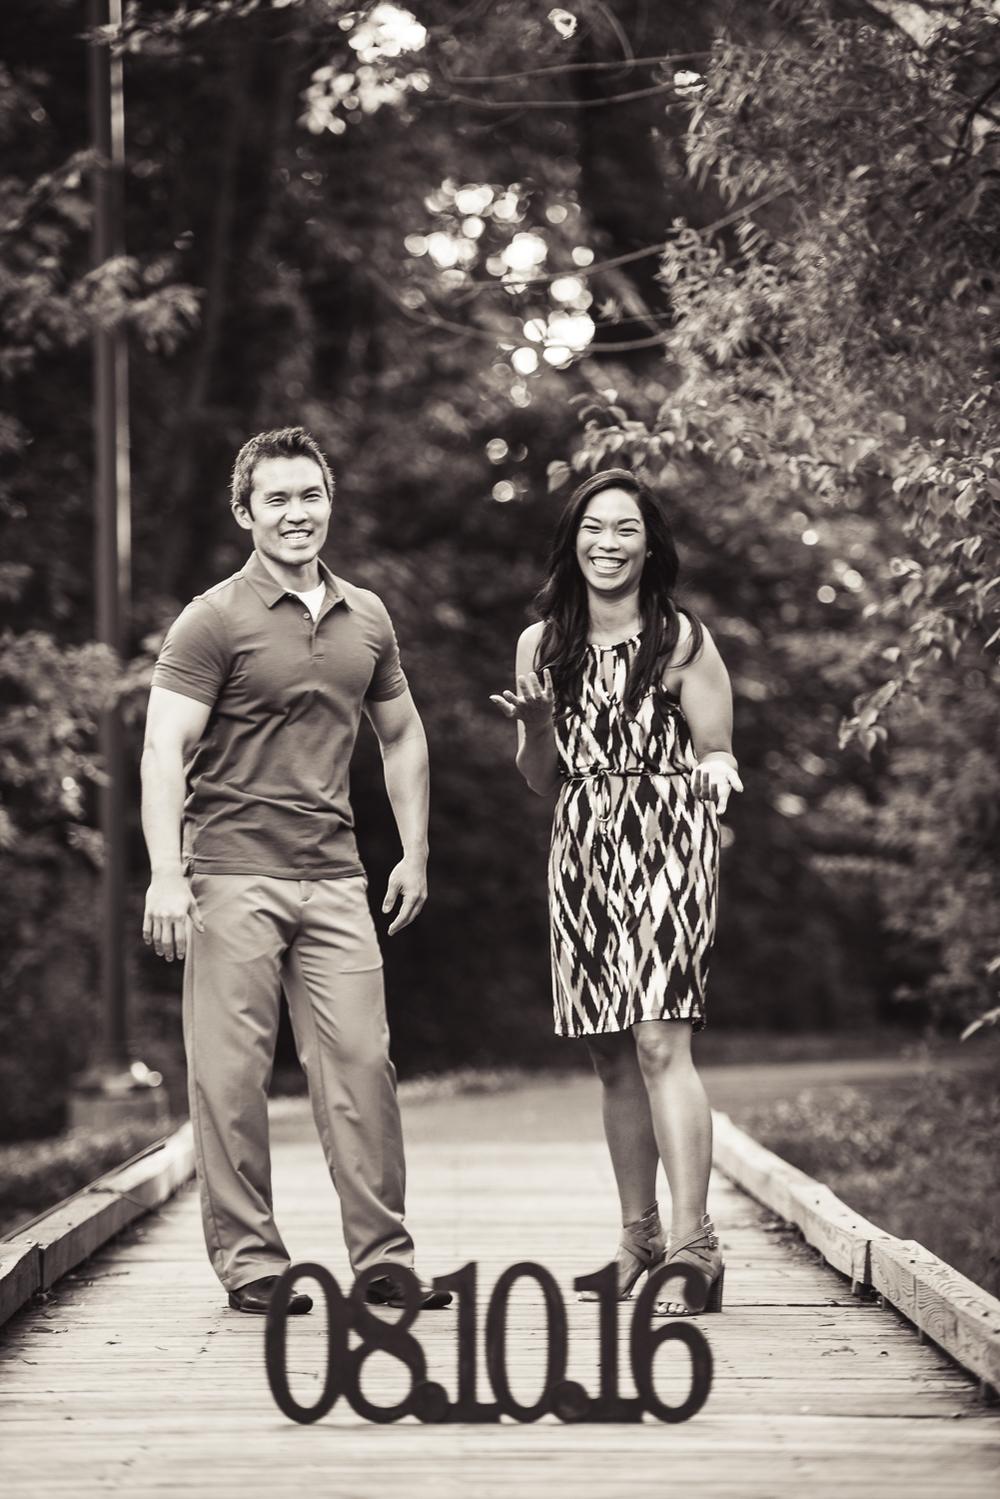 20160705 - Justine Wu Engagement Pix LR-3.jpg